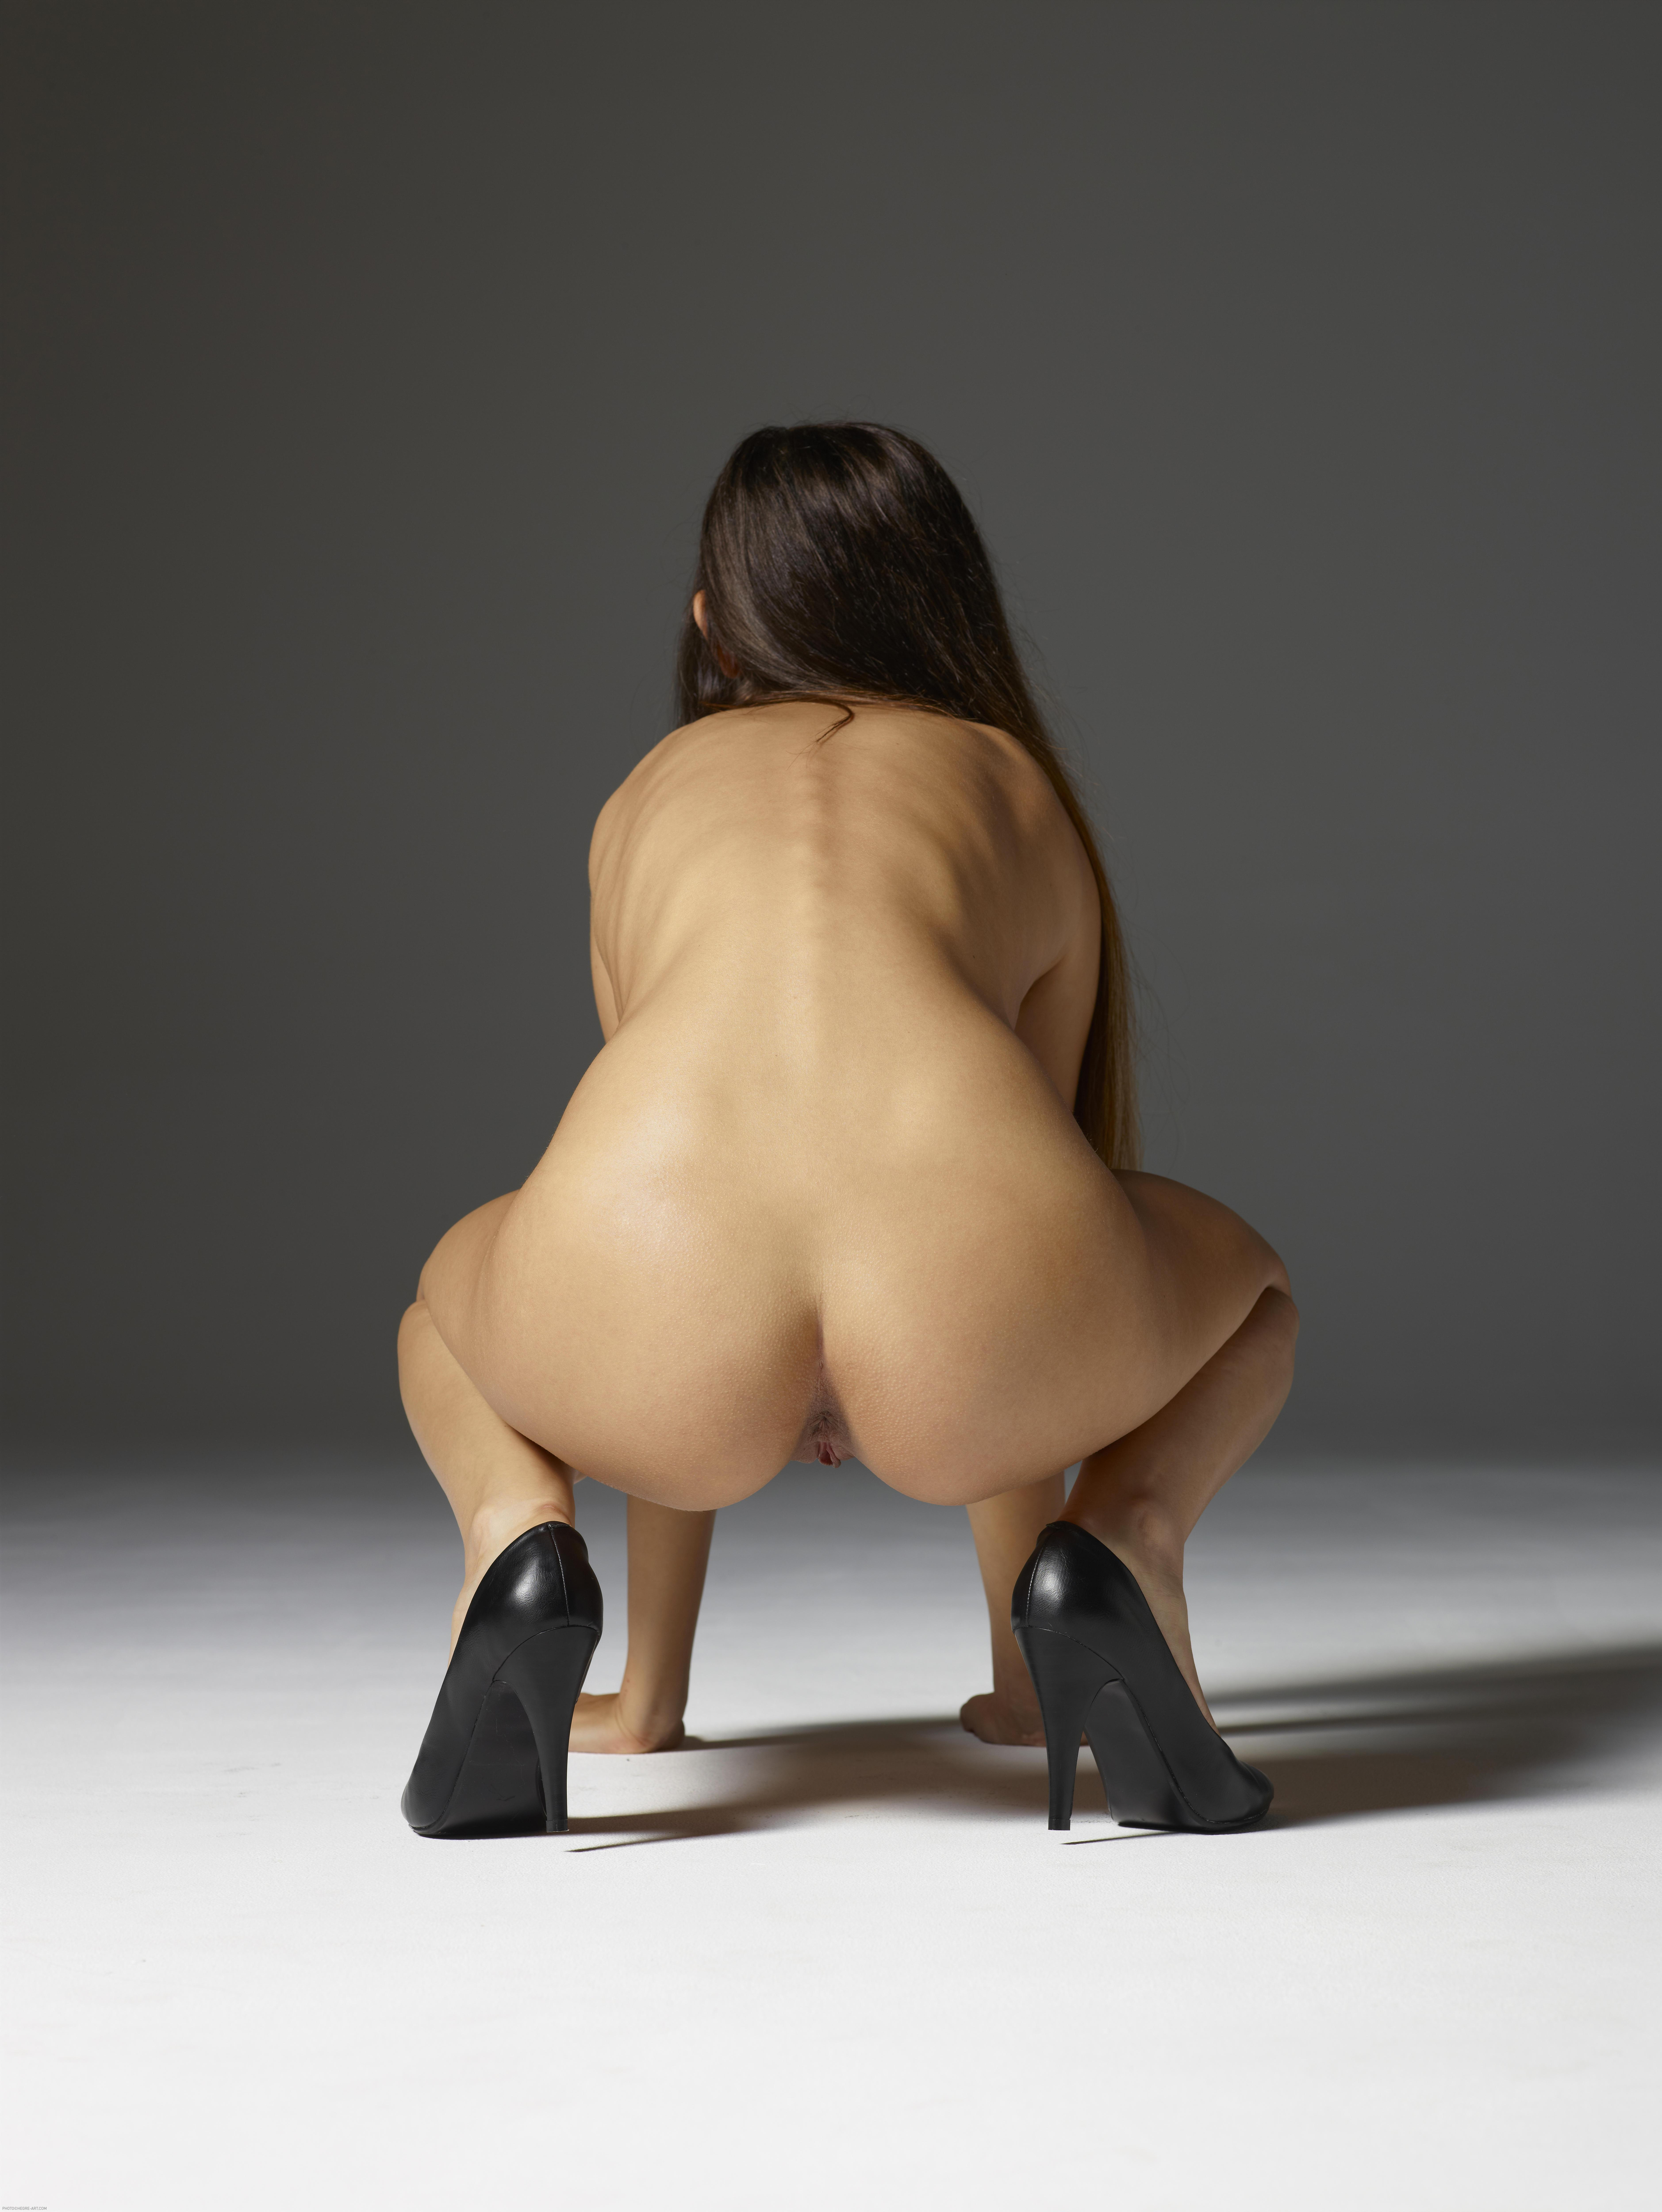 Testing the nude gymnastics talents of busty babe jenny